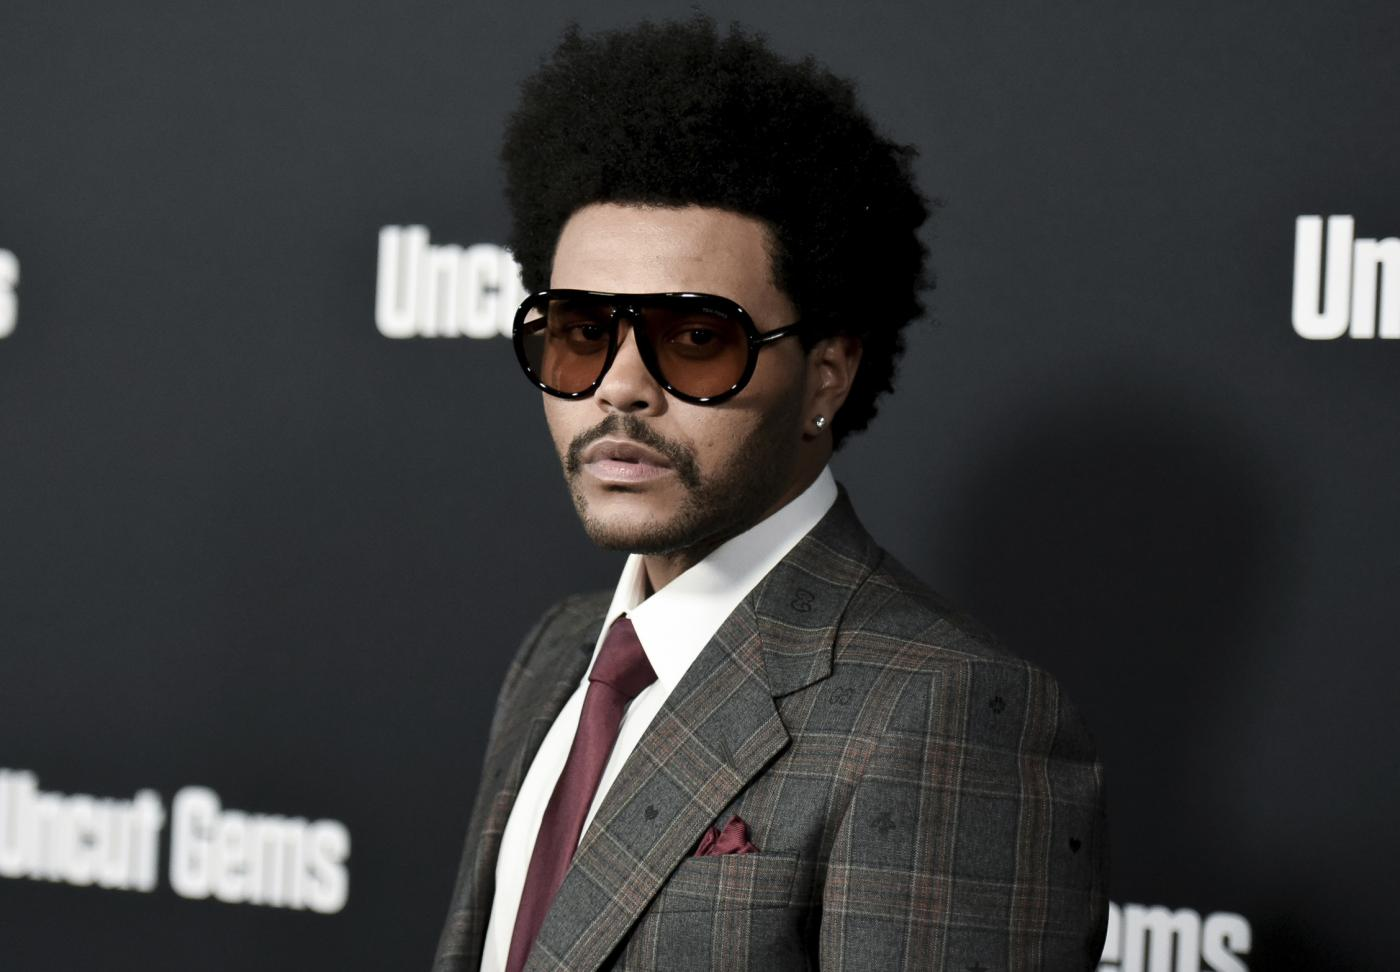 The Weeknd,Abel Makkonen Tesfaye